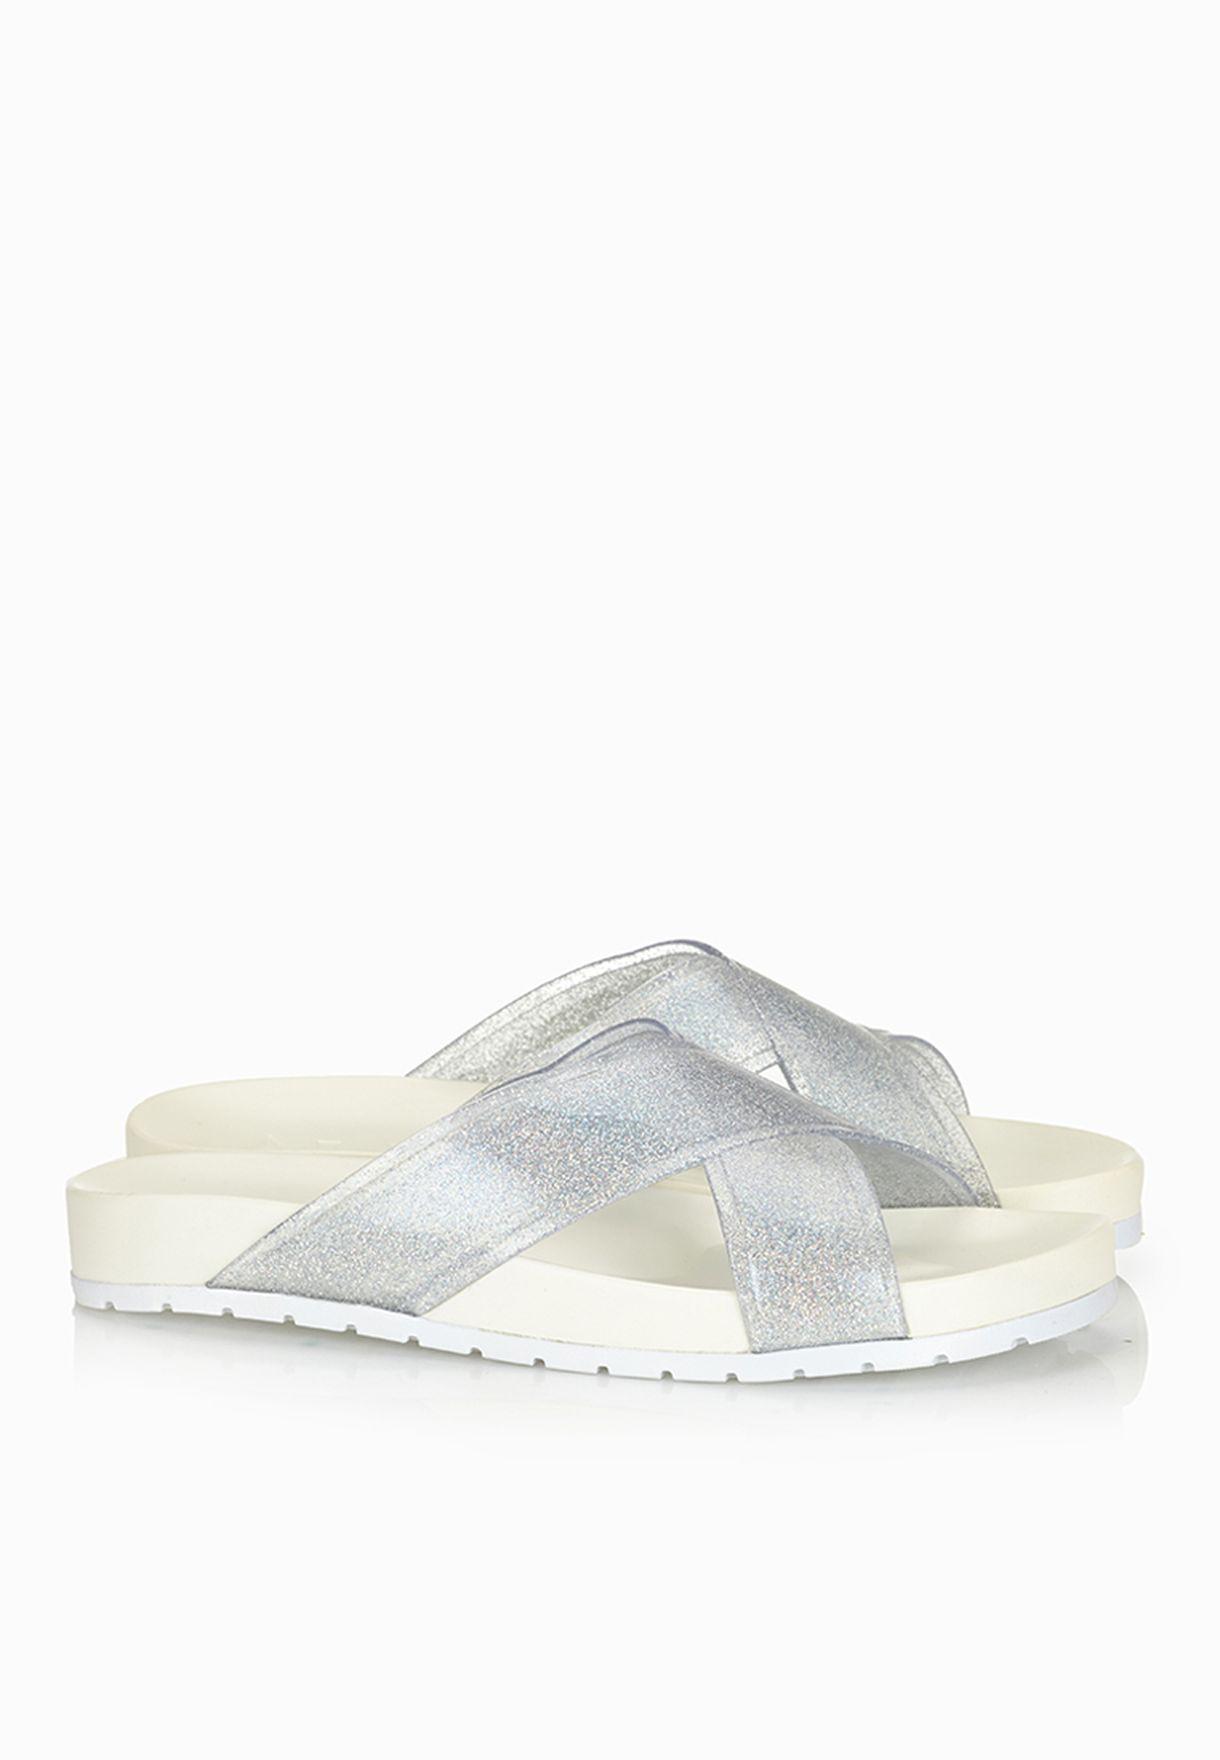 4a8293535 Shop Aldo silver Valery Cross Strap Jelly Sandals for Women in Qatar ...